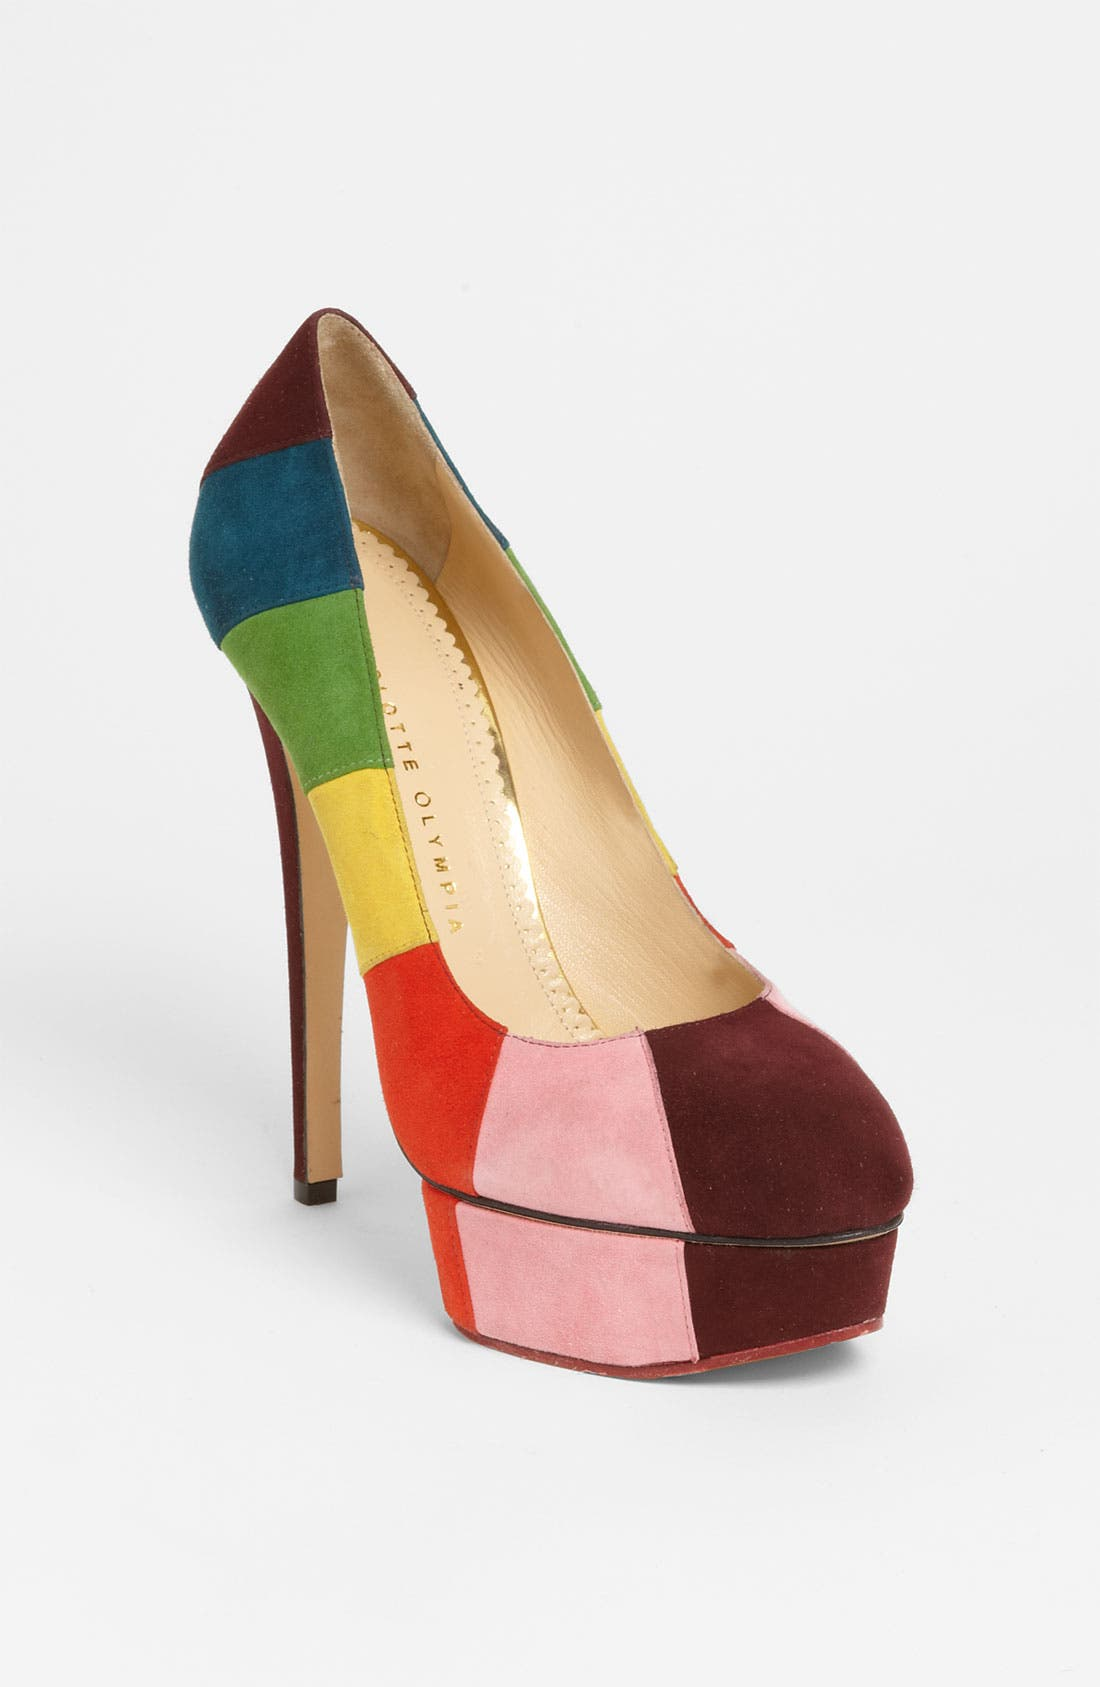 Main Image - Charlotte Olympia 'Rainbow' Pump